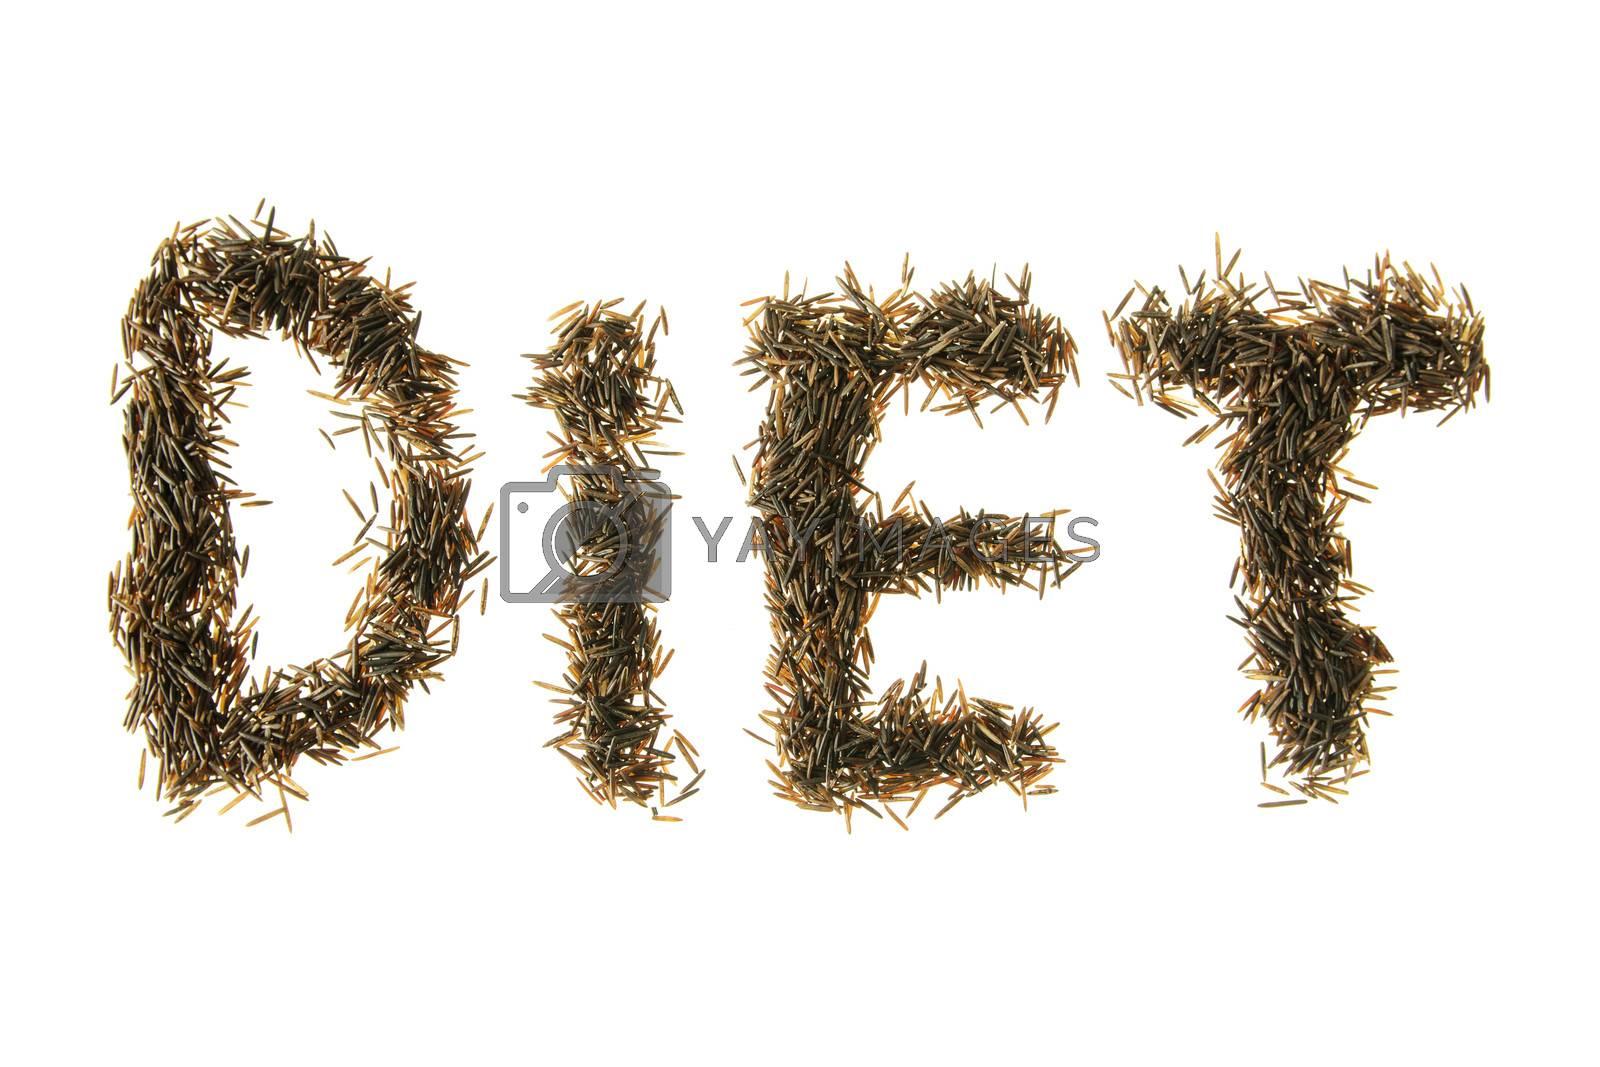 Wild rice grains made to spell diet